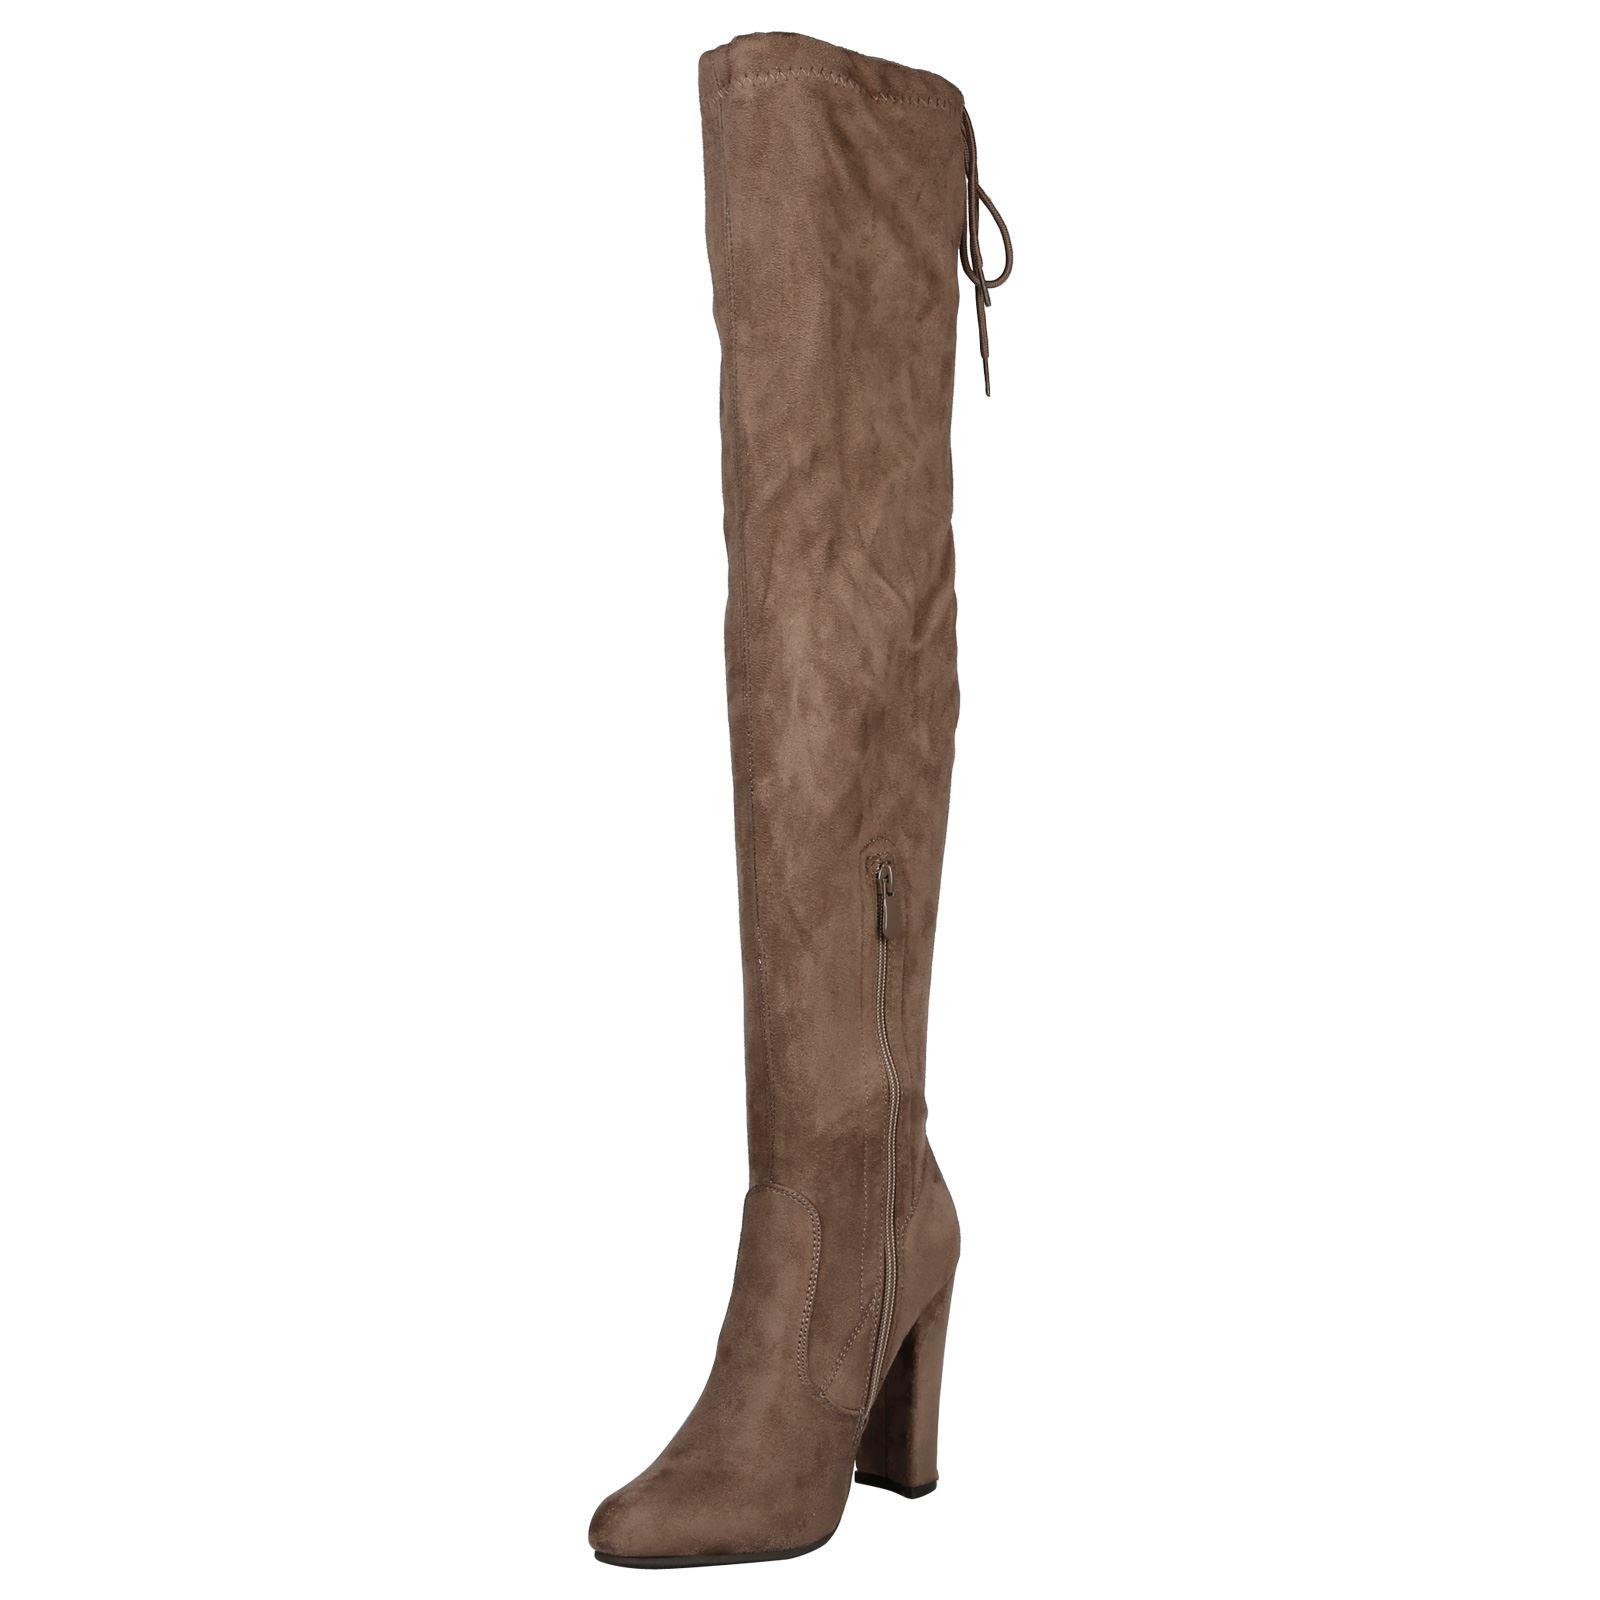 Iliana-Womens-Knee-High-Zip-Up-Adjustable-Pull-Strings-Mid-High-Block-Heel-Boots thumbnail 8